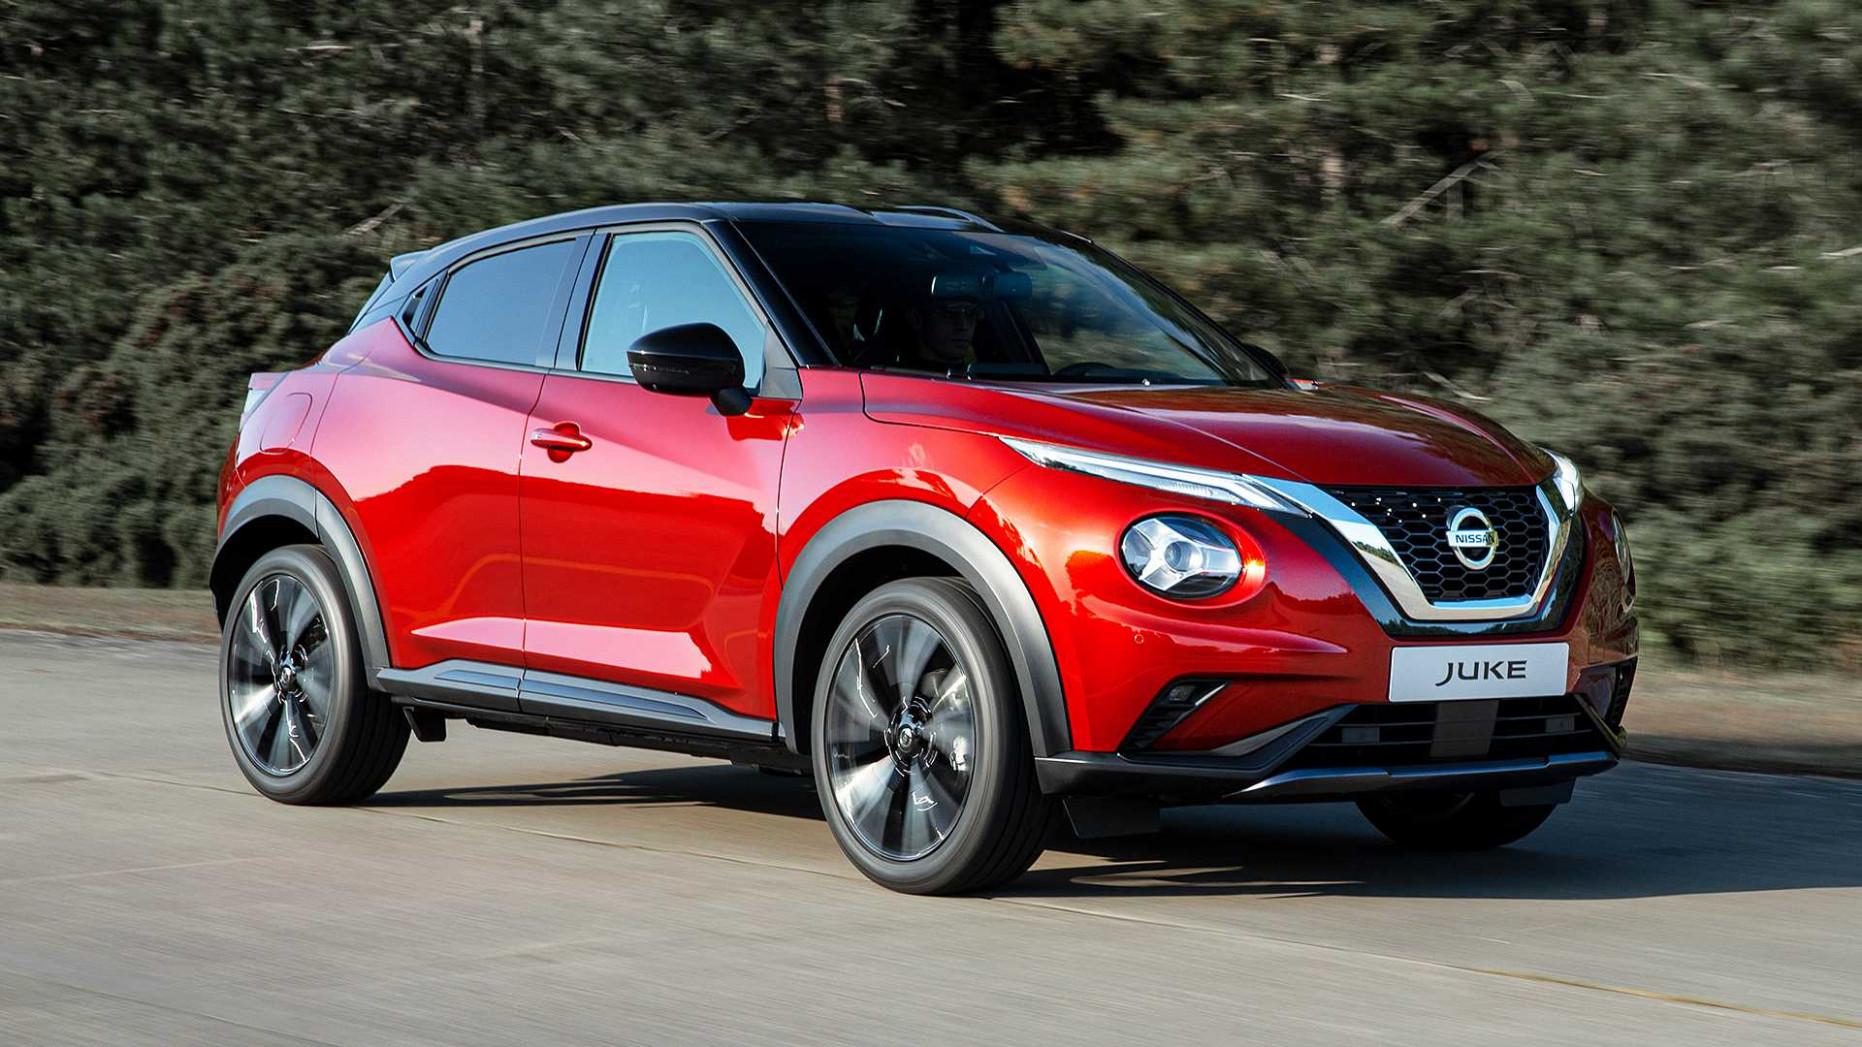 Picture 2022 Nissan Juke